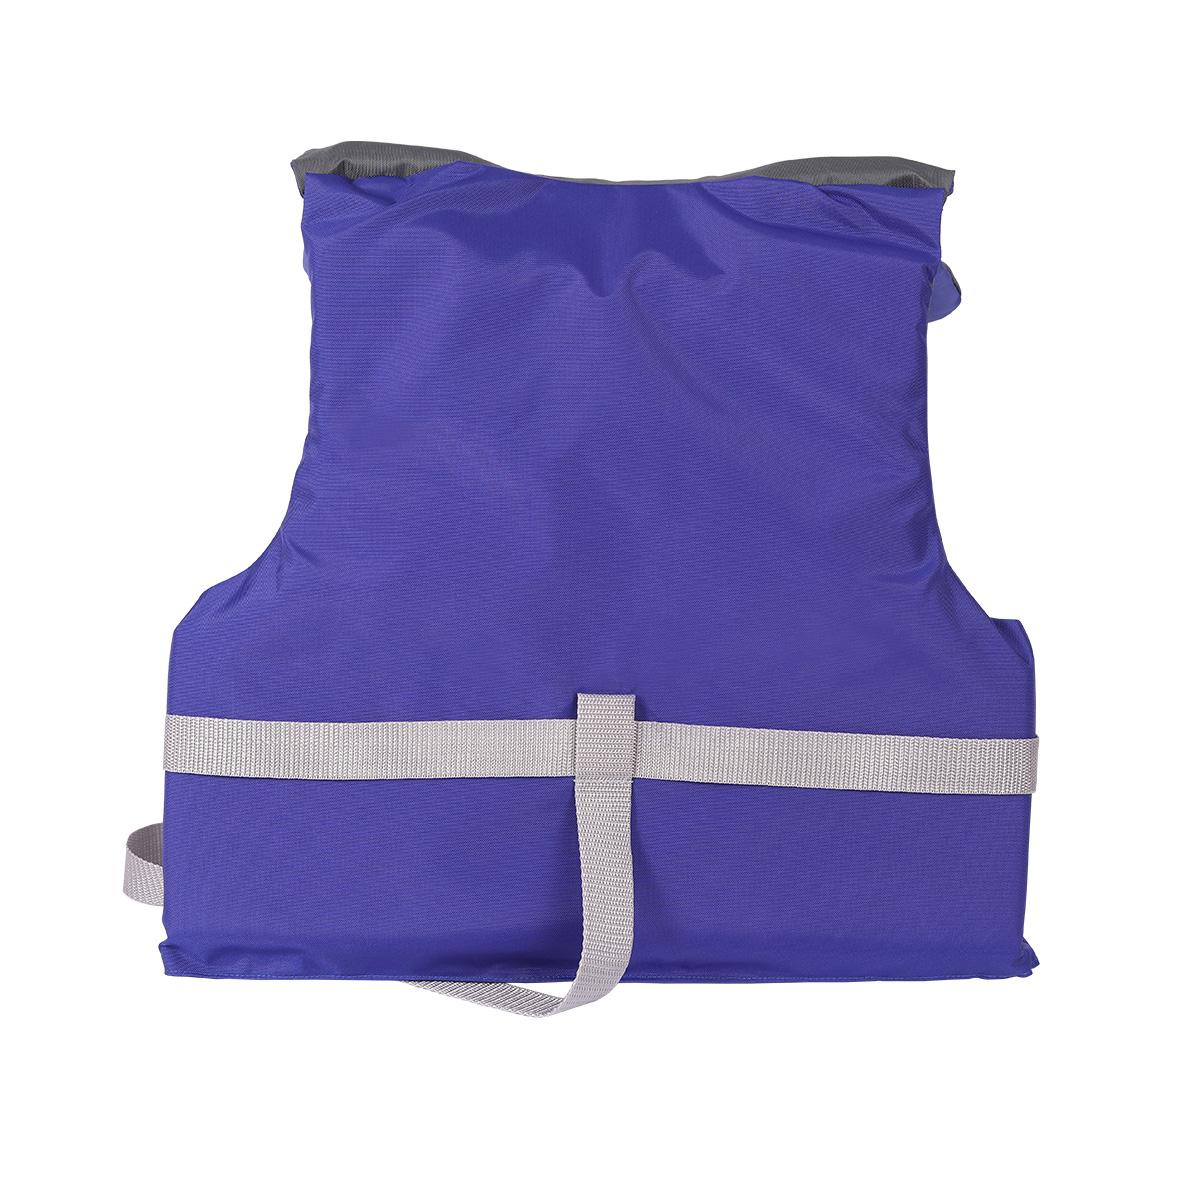 Swim Kids Children/'s PURPLE Swimming Vest Buoyant Aid